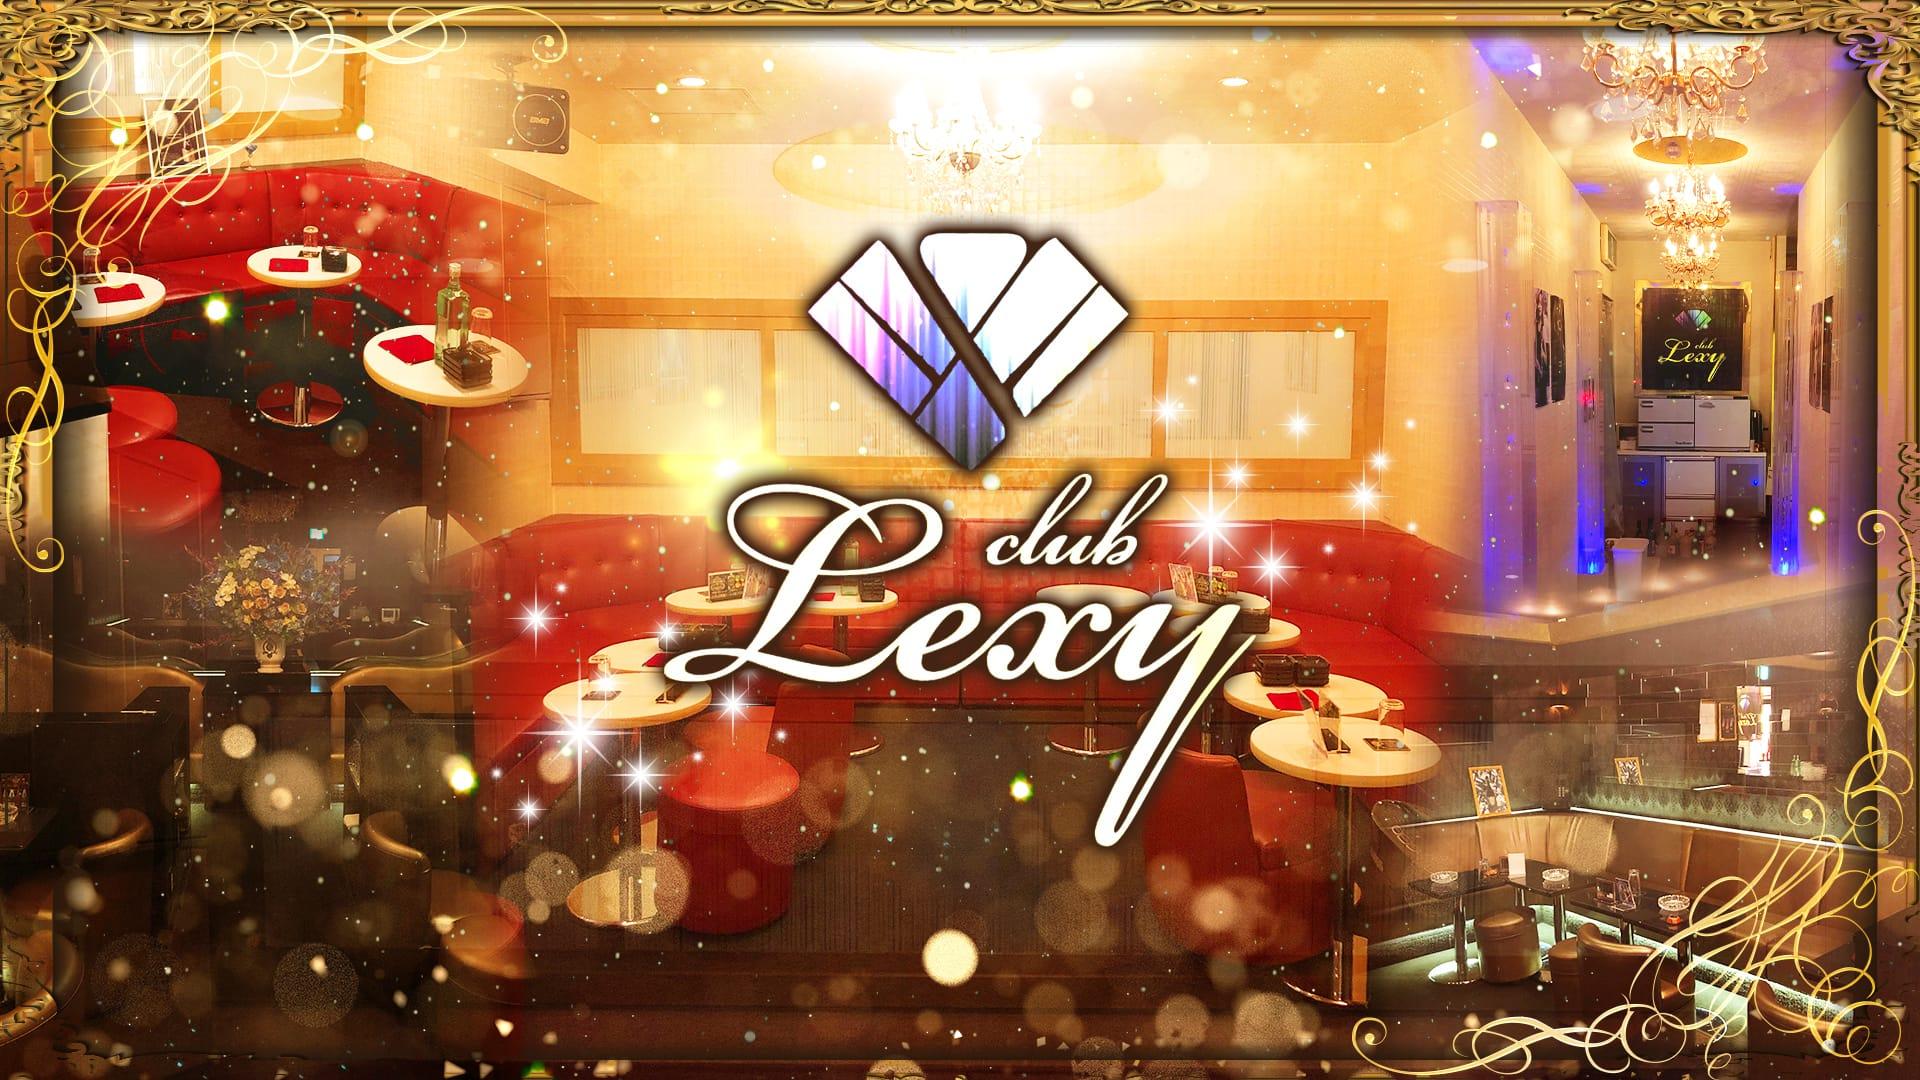 club LEXY(レクシー) 大和姉キャバ・半熟キャバ TOP画像